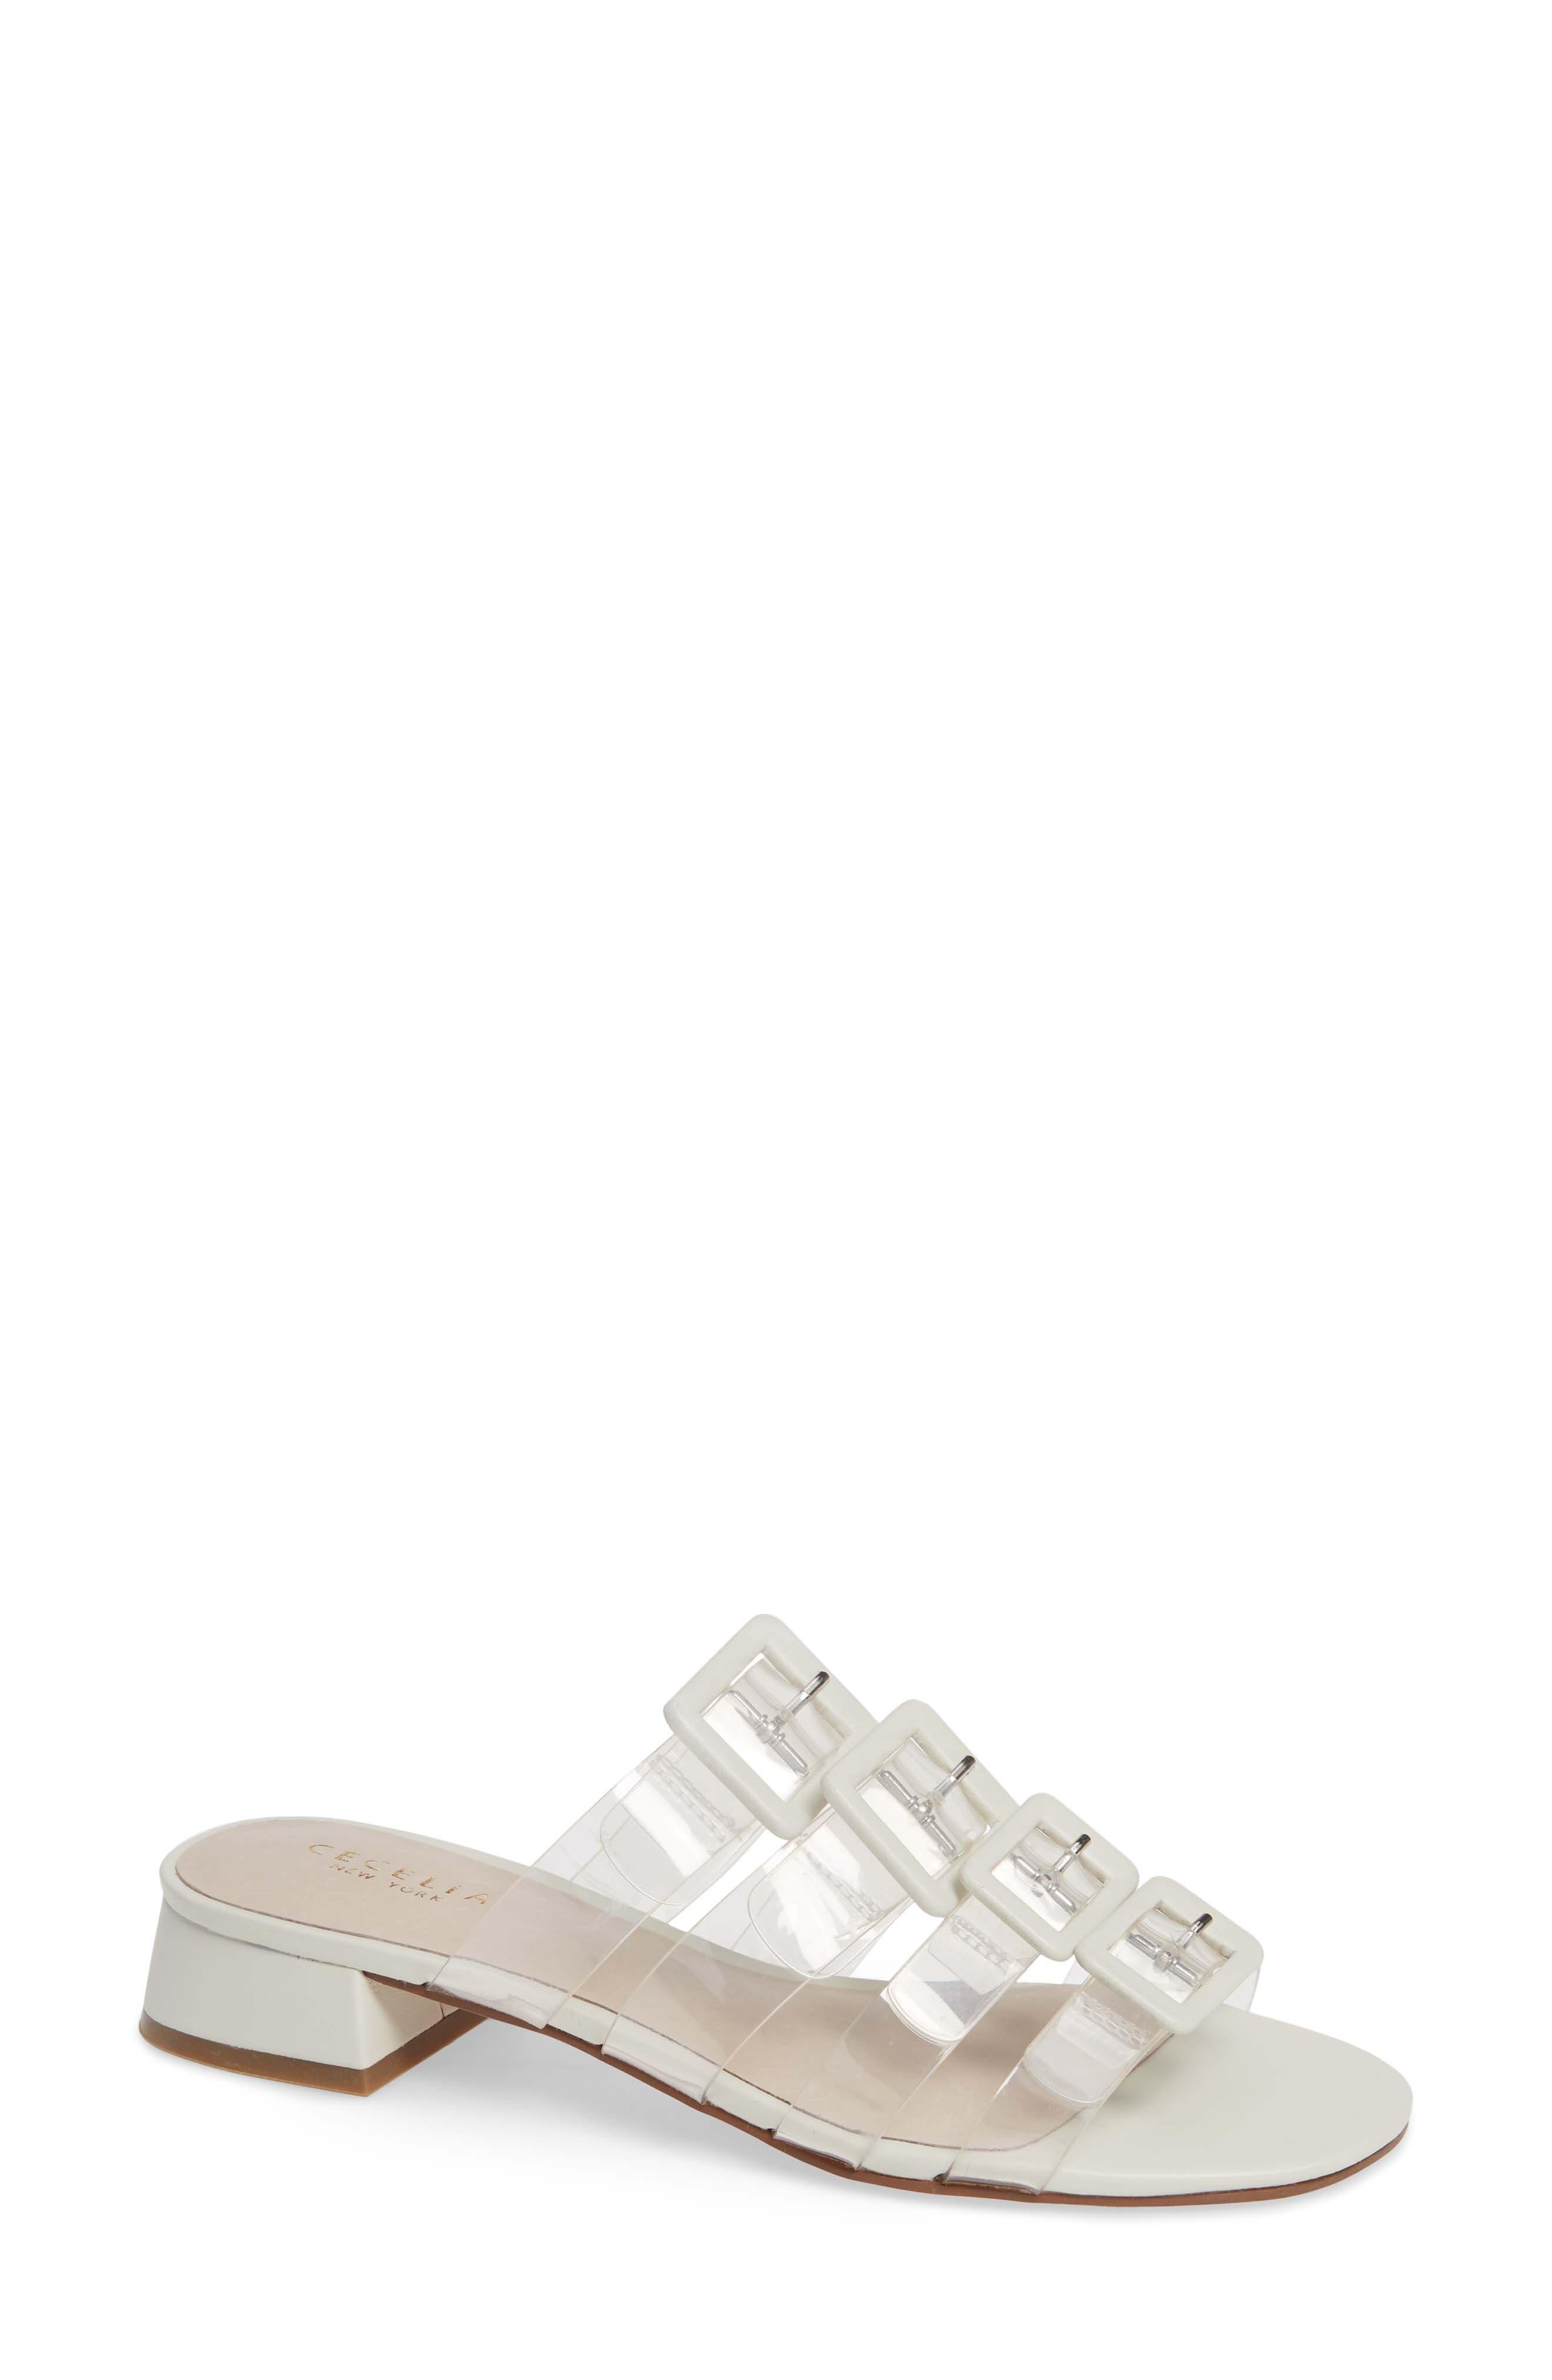 Cecelia New York Lincoln Strappy Clear Slide Sandal, White